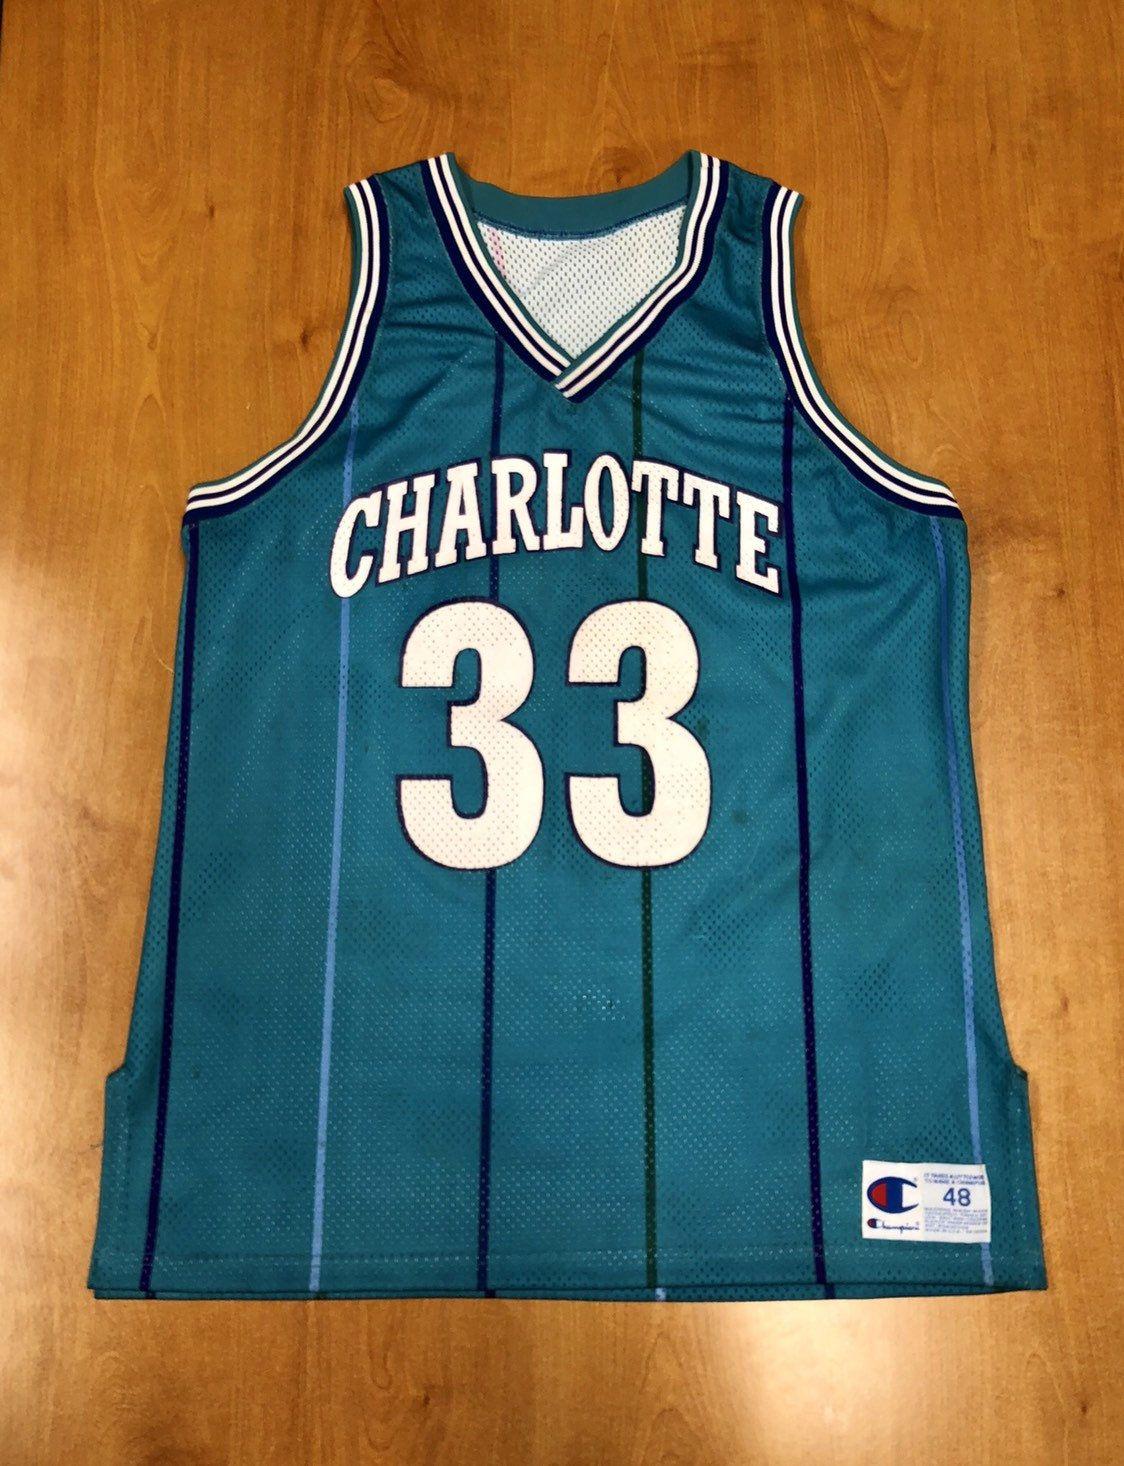 12a2fbf2008 Vintage 1995 Alonzo Mourning Charlotte Hornets Prototype Authentic Champion  Jersey Size 48 larry johnson michael jordan kemba walker nba by ...